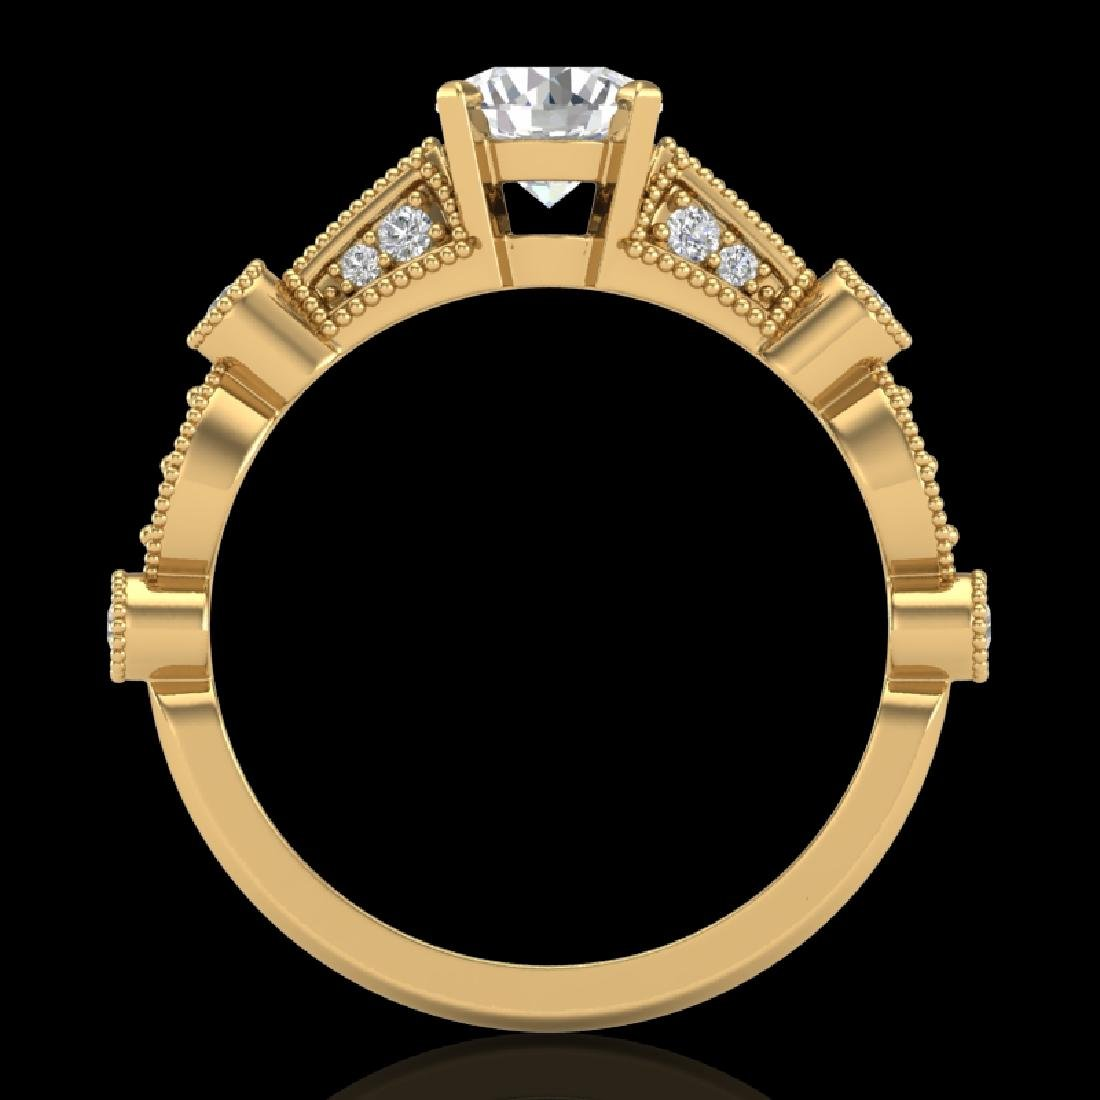 1.03 CTW VS/SI Diamond Solitaire Art Deco Ring 18K